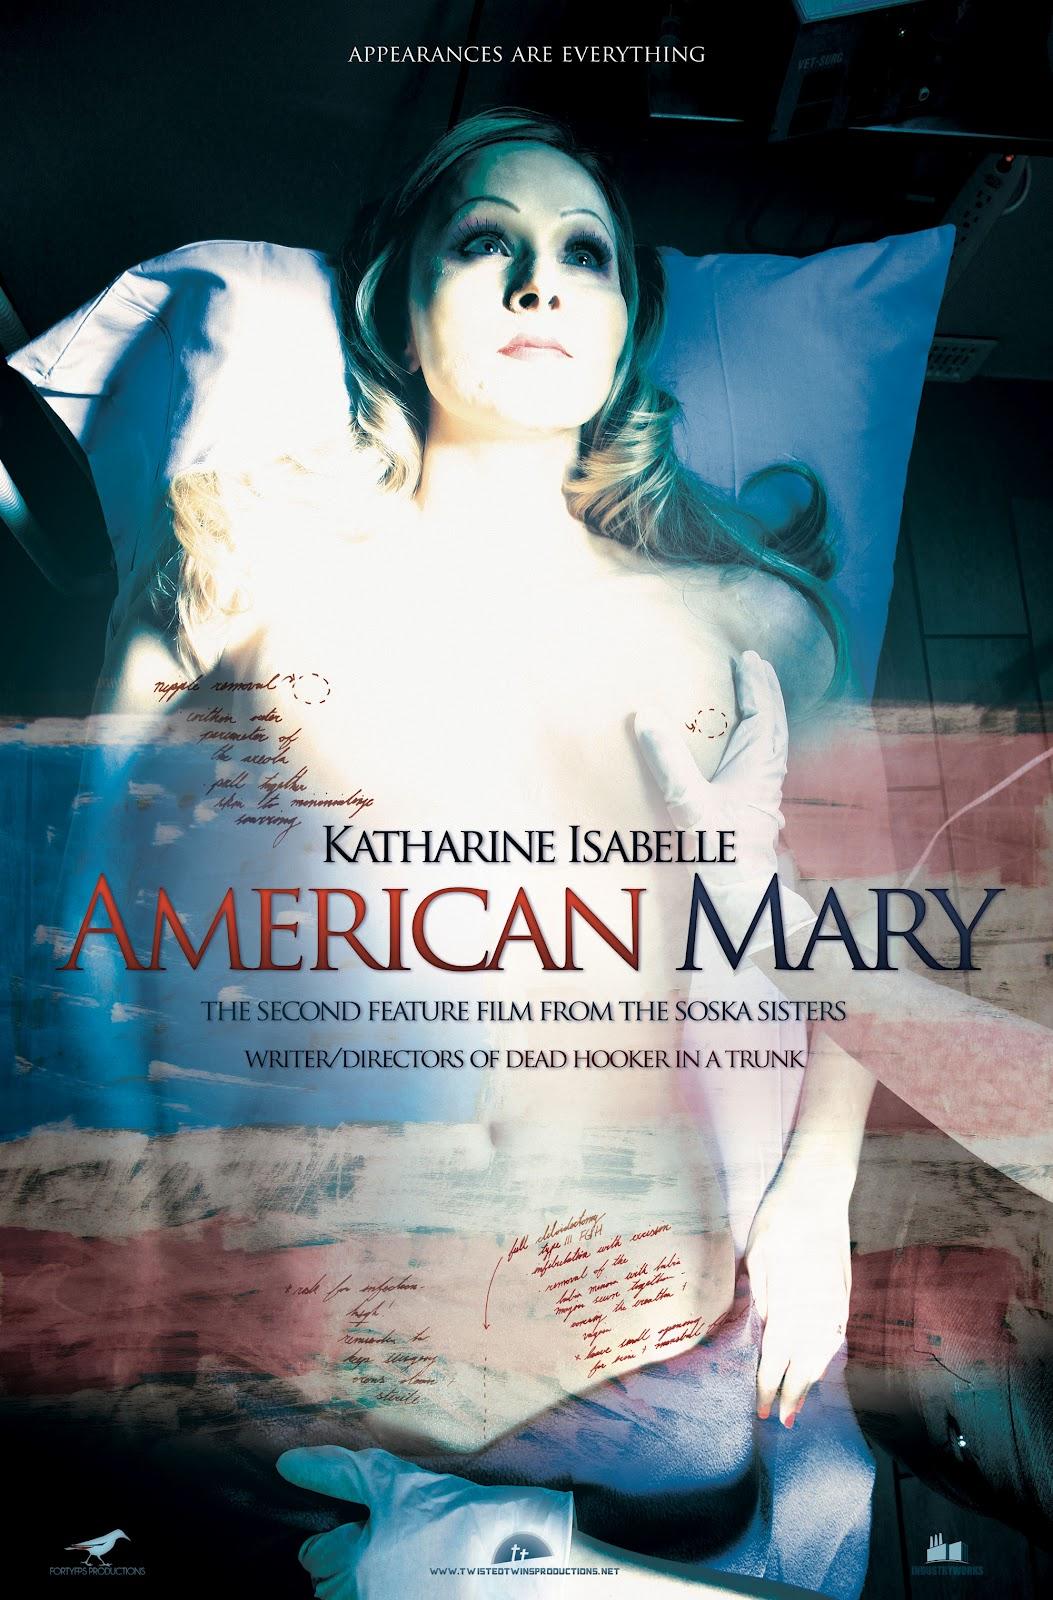 http://4.bp.blogspot.com/-MrNb22Vg4kk/UHMj2i68aWI/AAAAAAAARCY/VJs8IoeSFjA/s1600/american-mary-poster.jpg